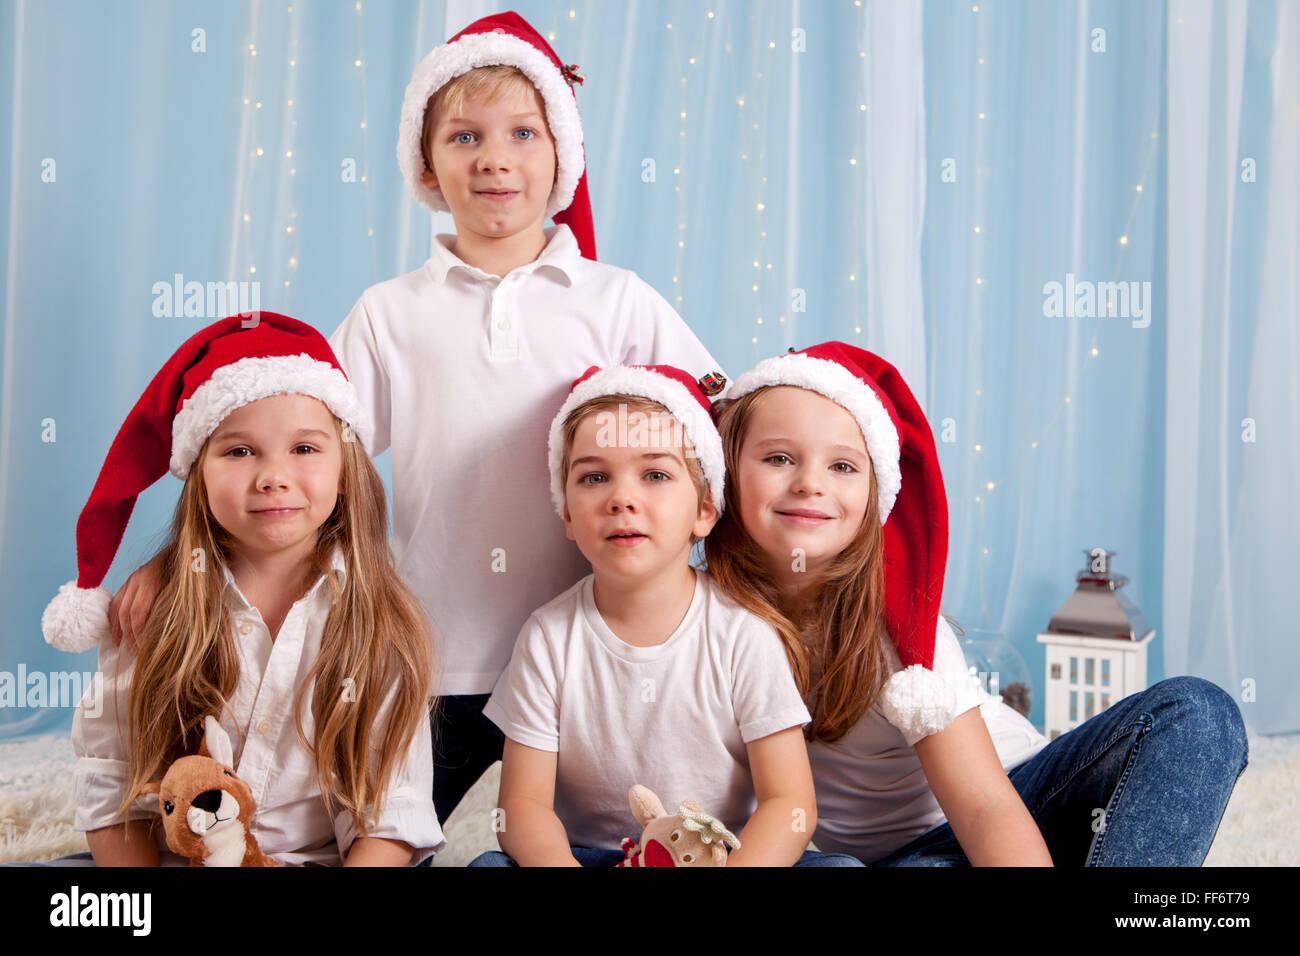 Four adorable kids, preschool children, having fun for christmas, studio shot - Stock Image